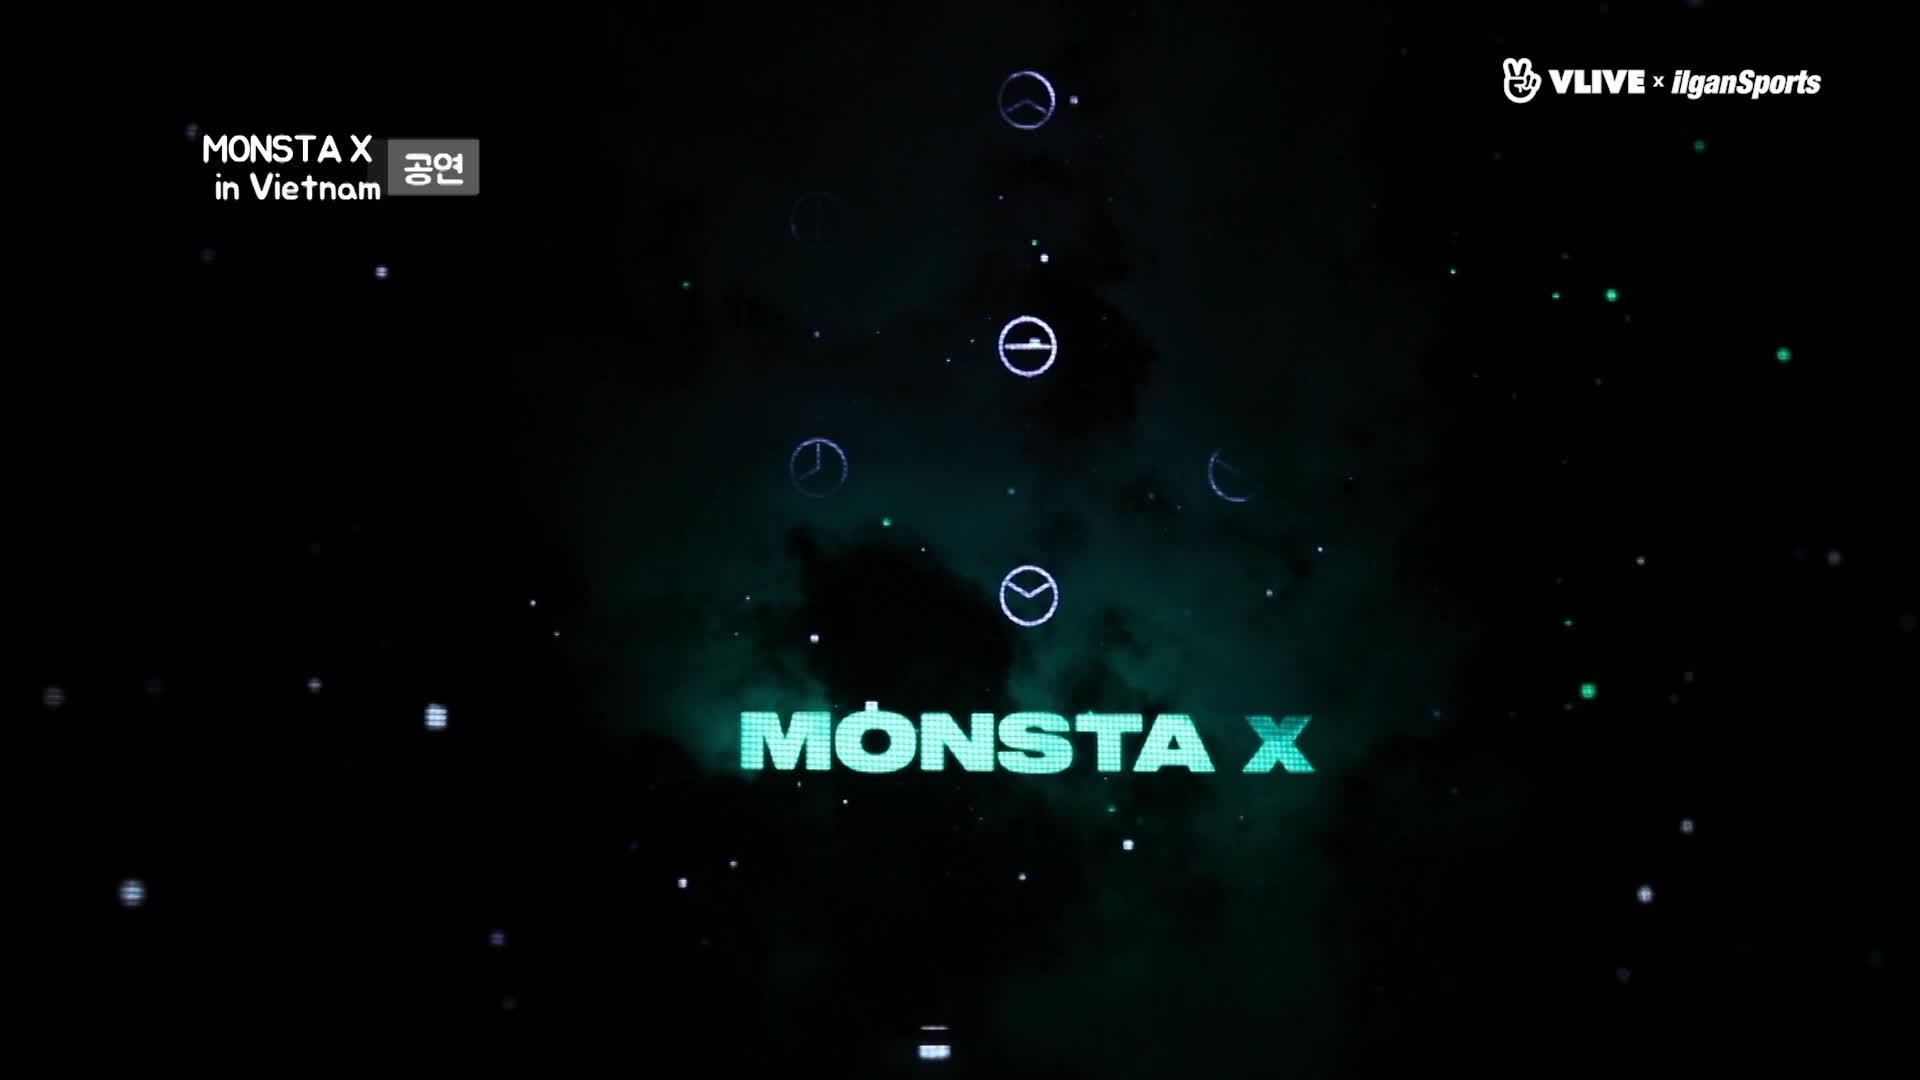 [MONSTA X in Vietnam] 두근두근 드디어! 베트남 첫 공연과 대기실 비하인드